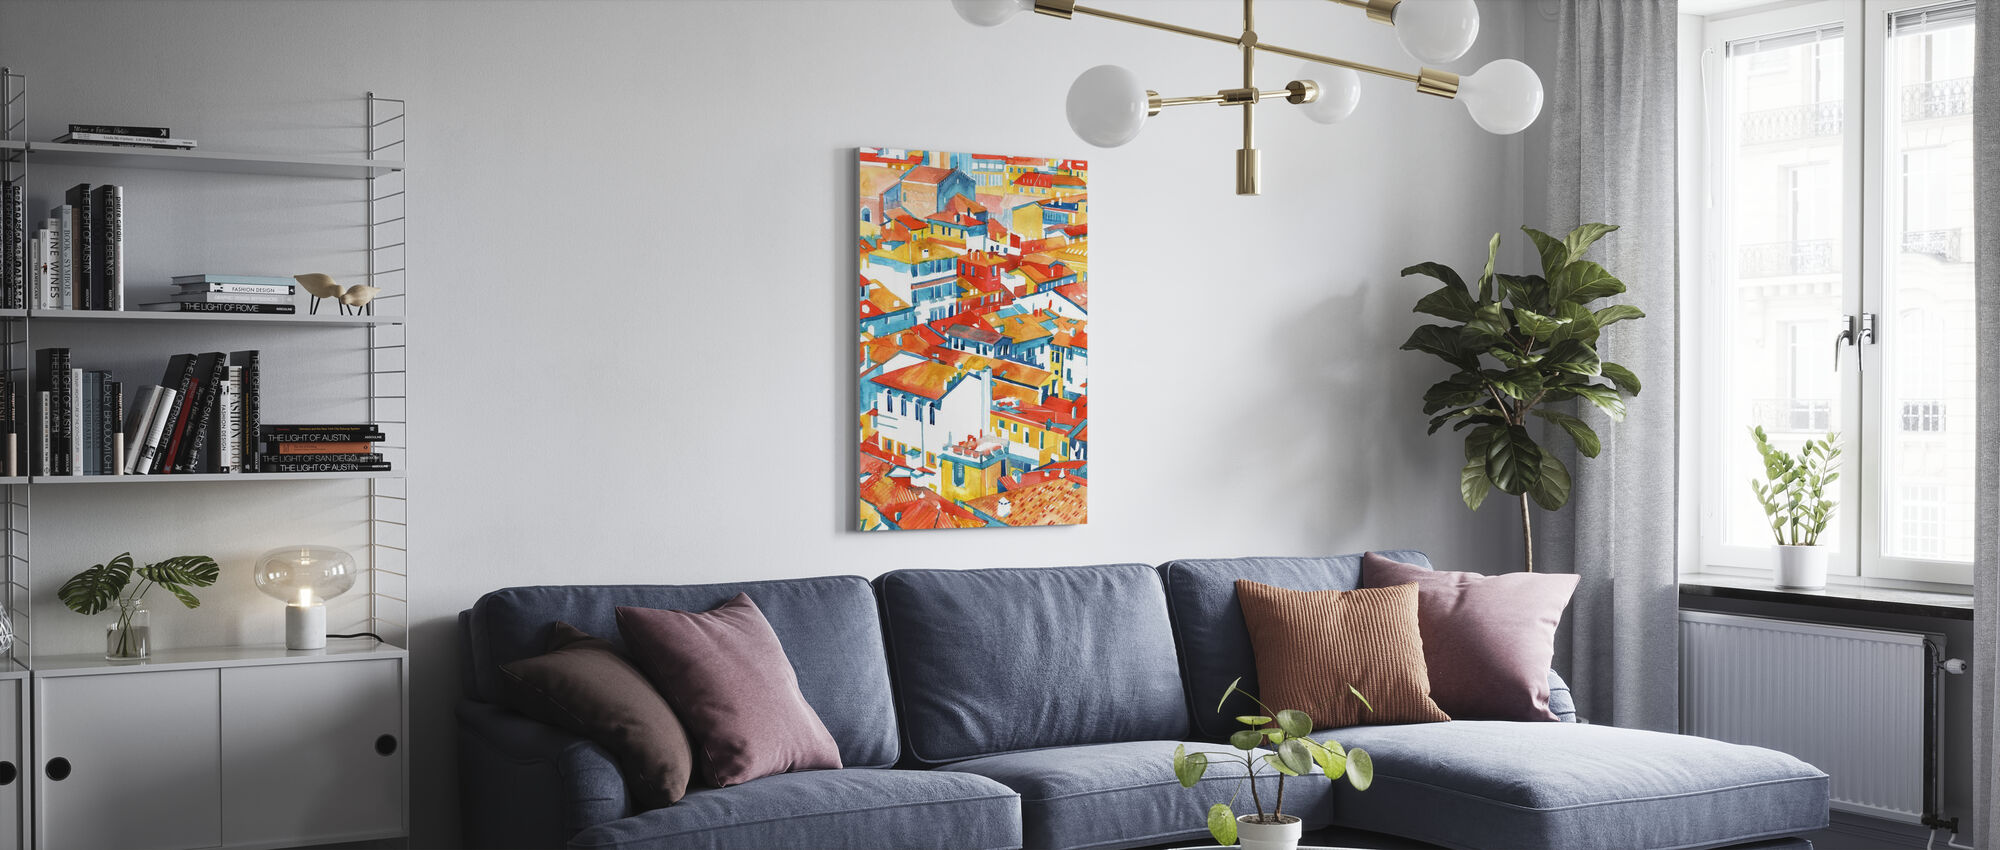 Verona Buildings - Canvas print - Living Room